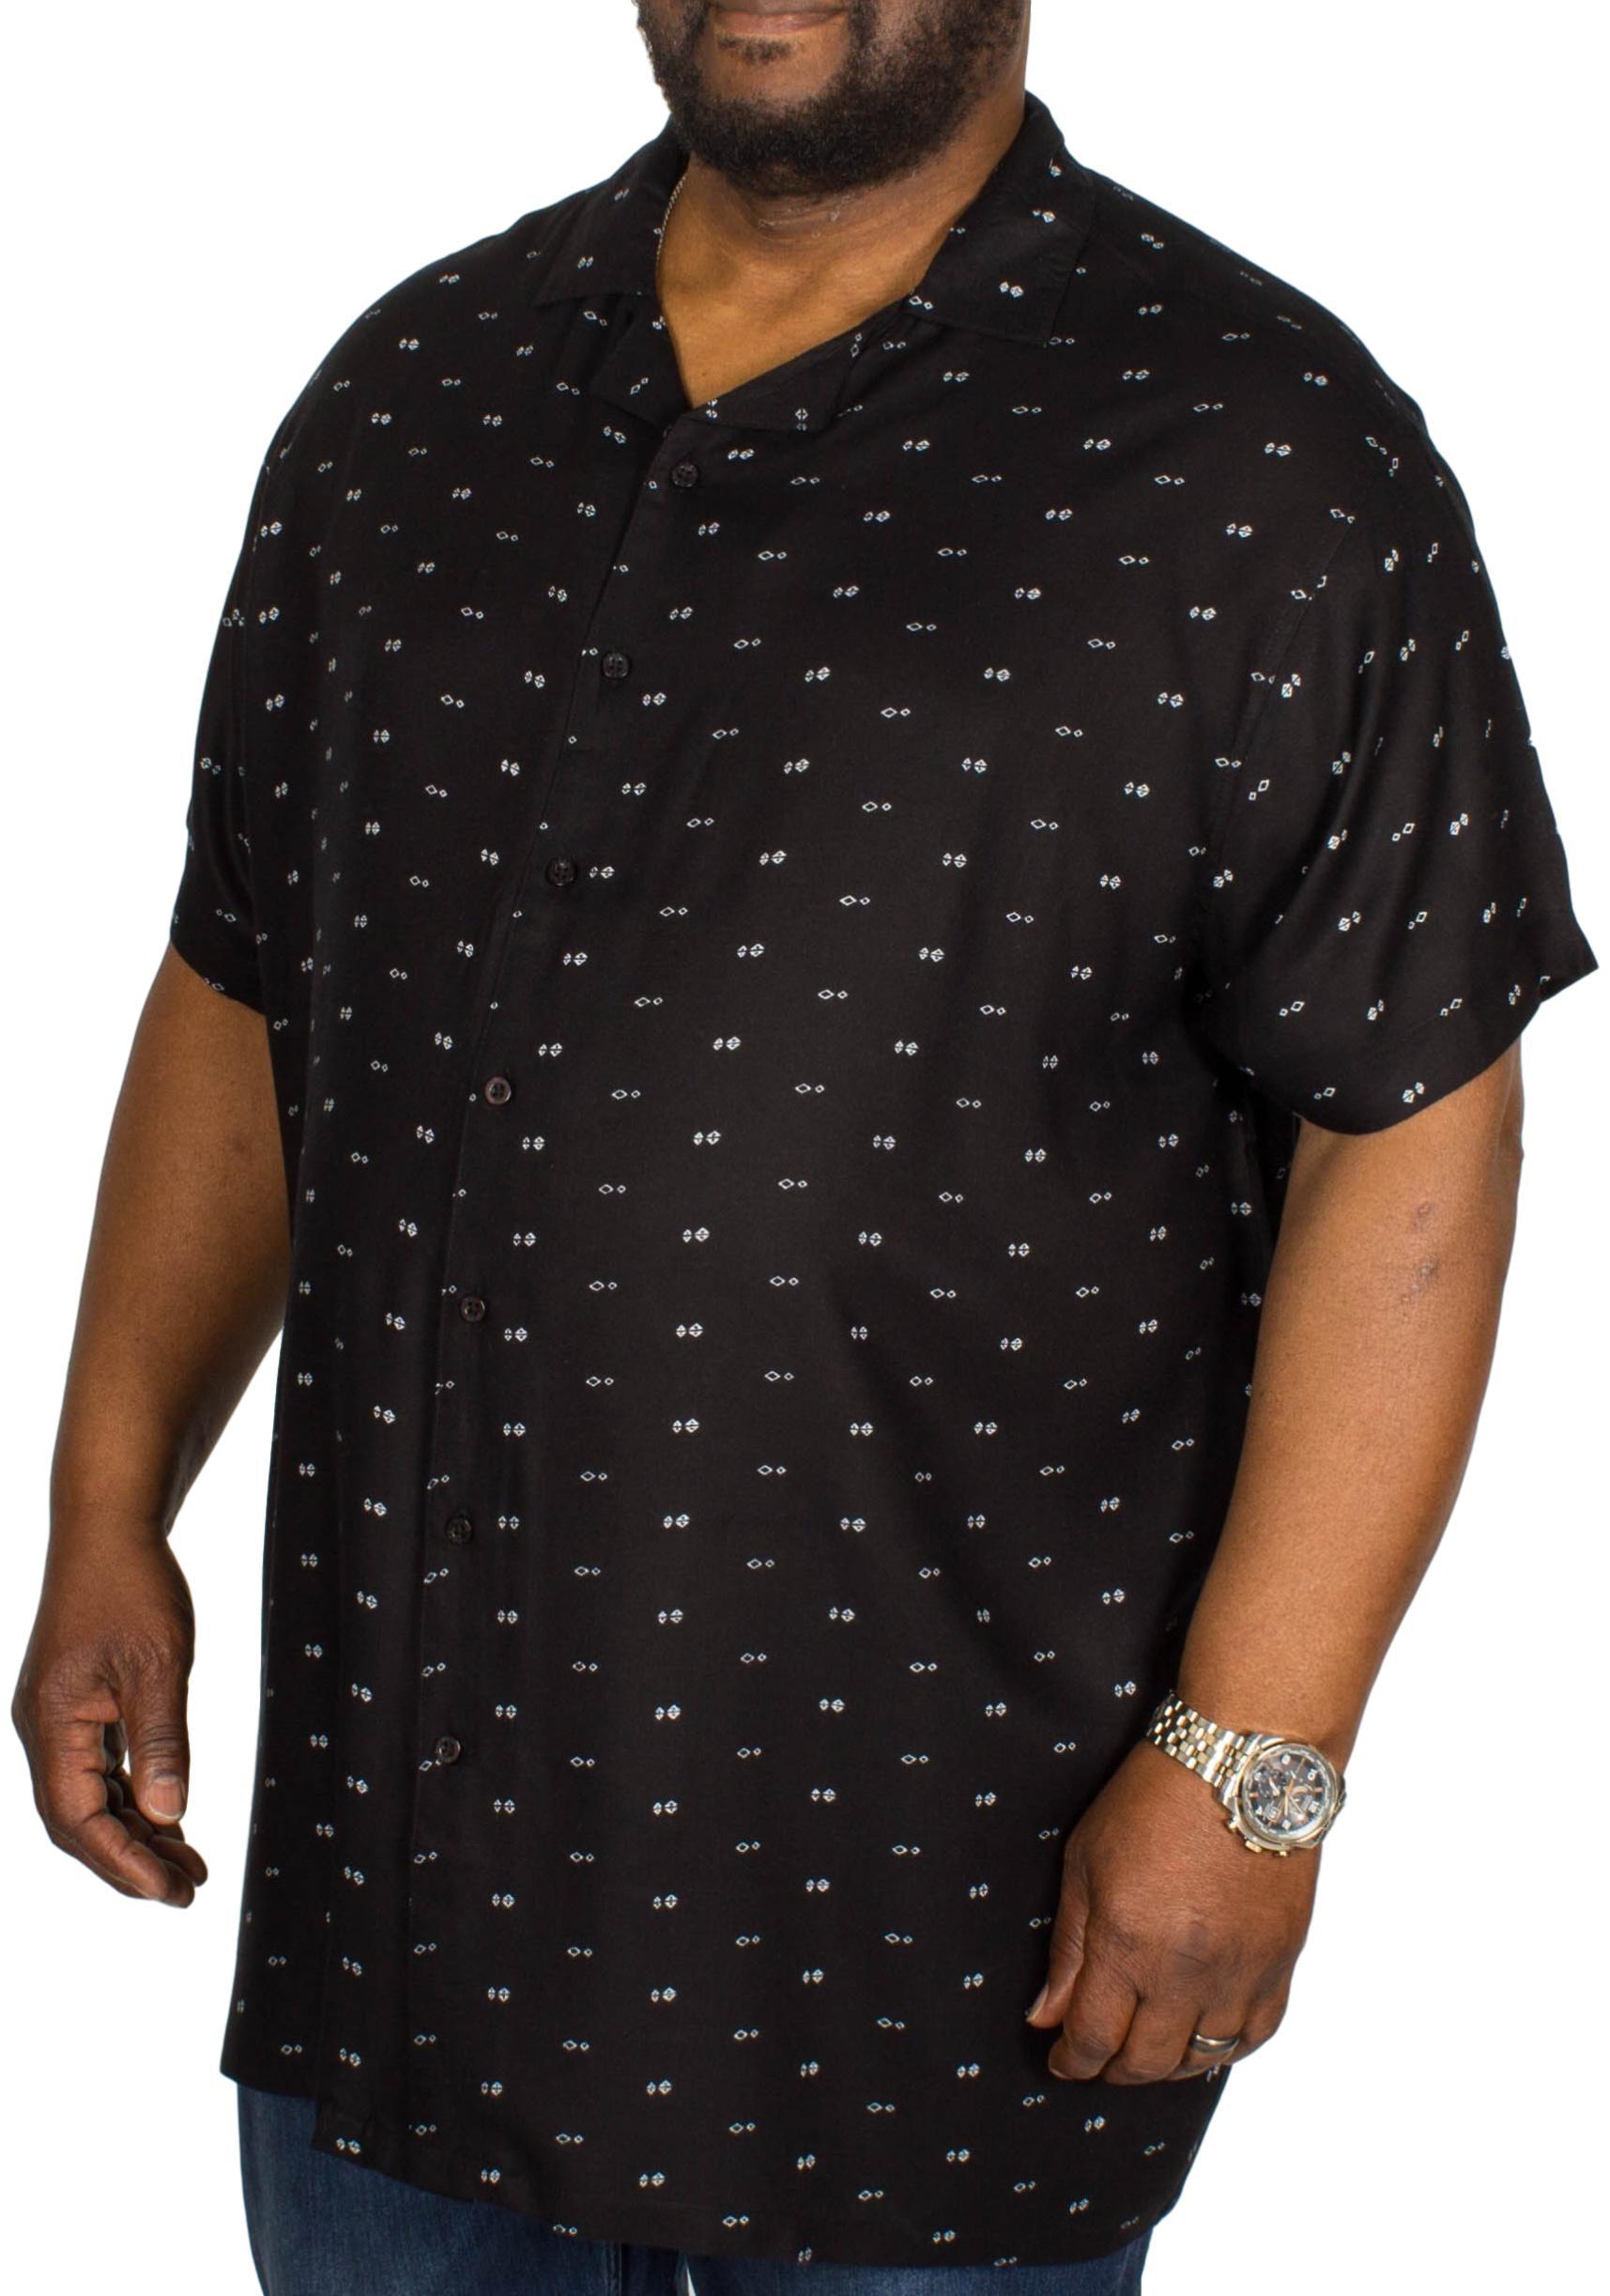 D555 Luciano Bowling Shirt Black